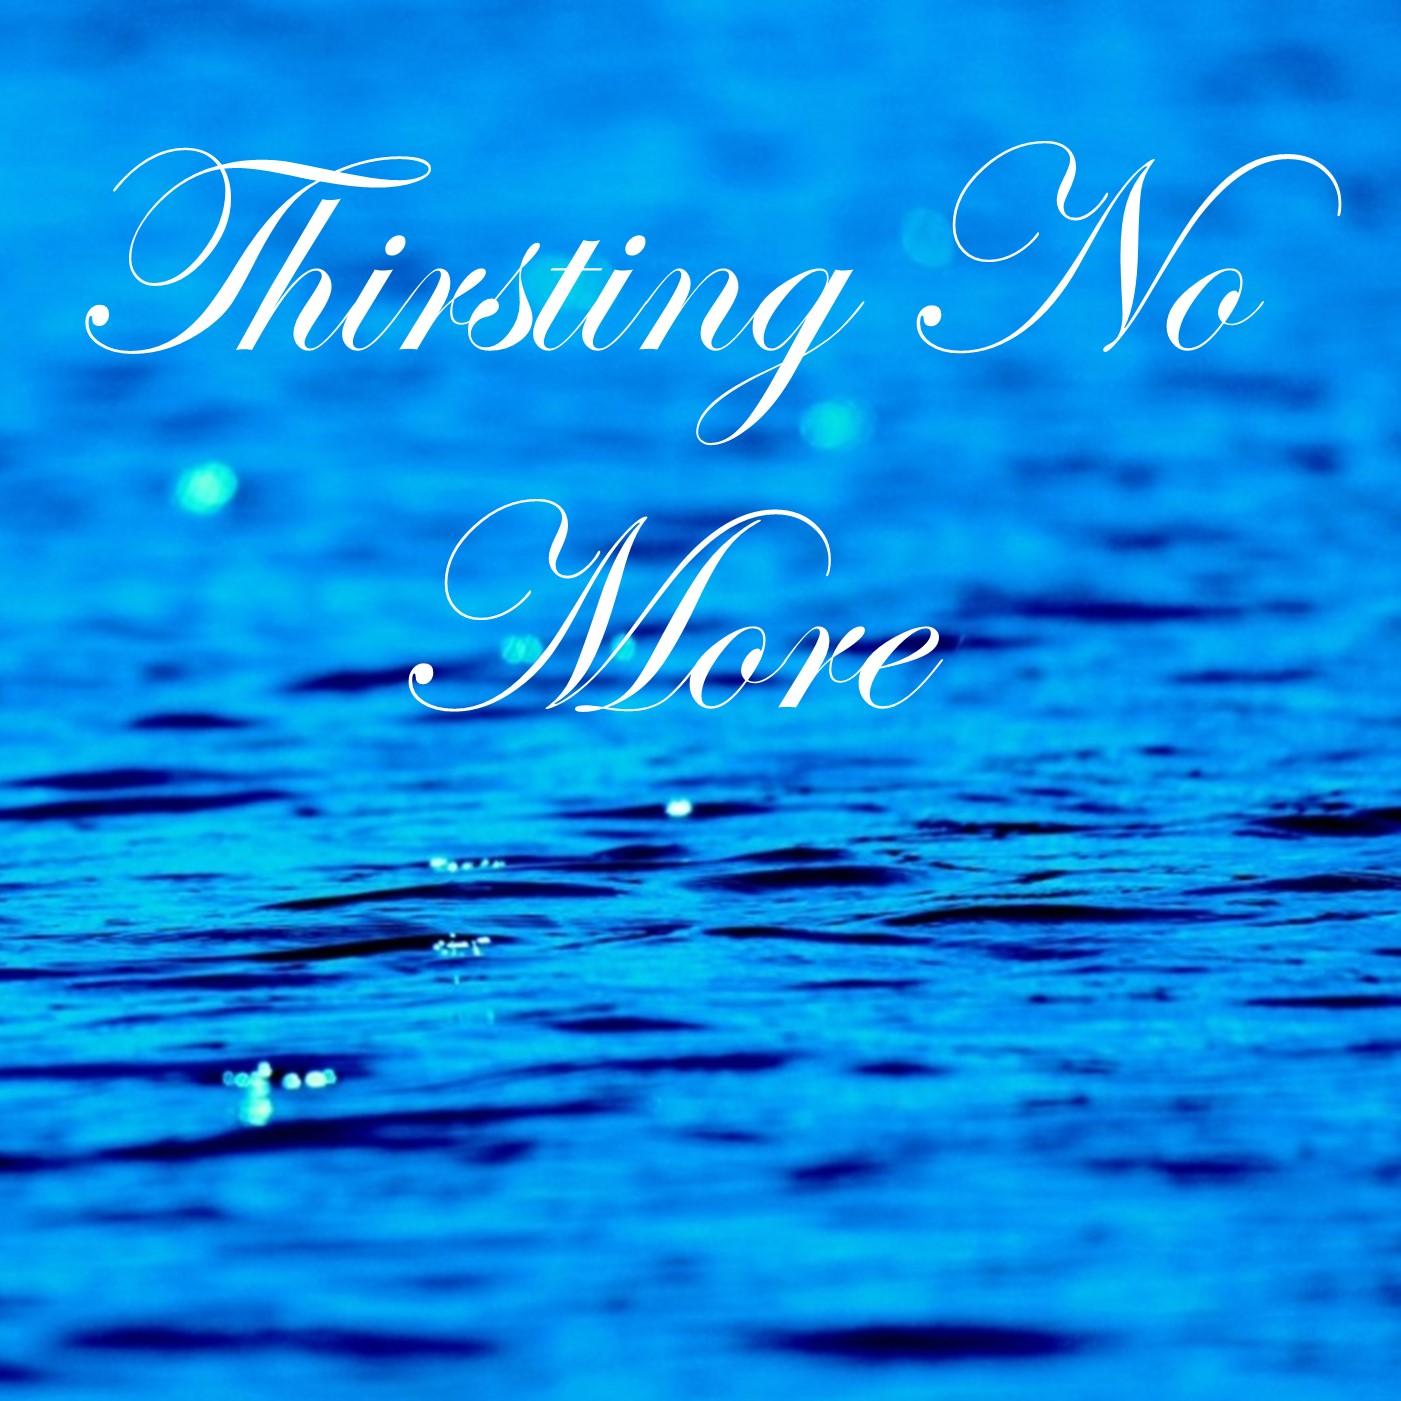 Thirsting No More